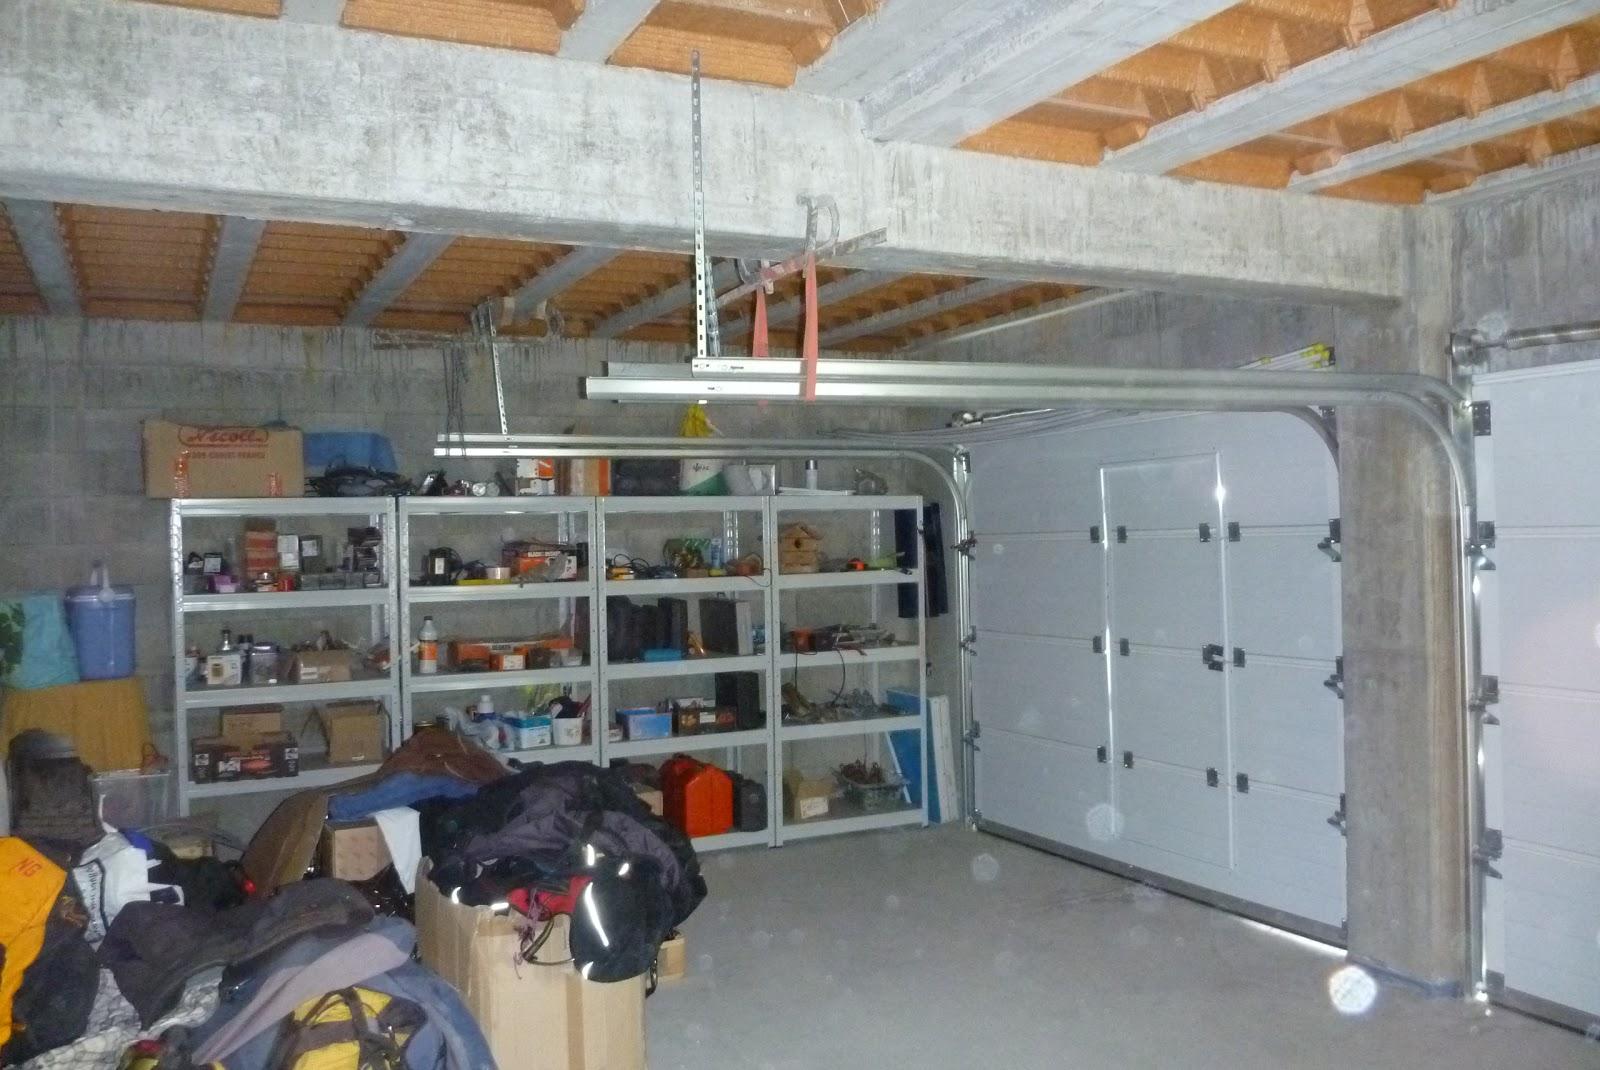 construire sa maison garage cellier salle de bain toilettes. Black Bedroom Furniture Sets. Home Design Ideas